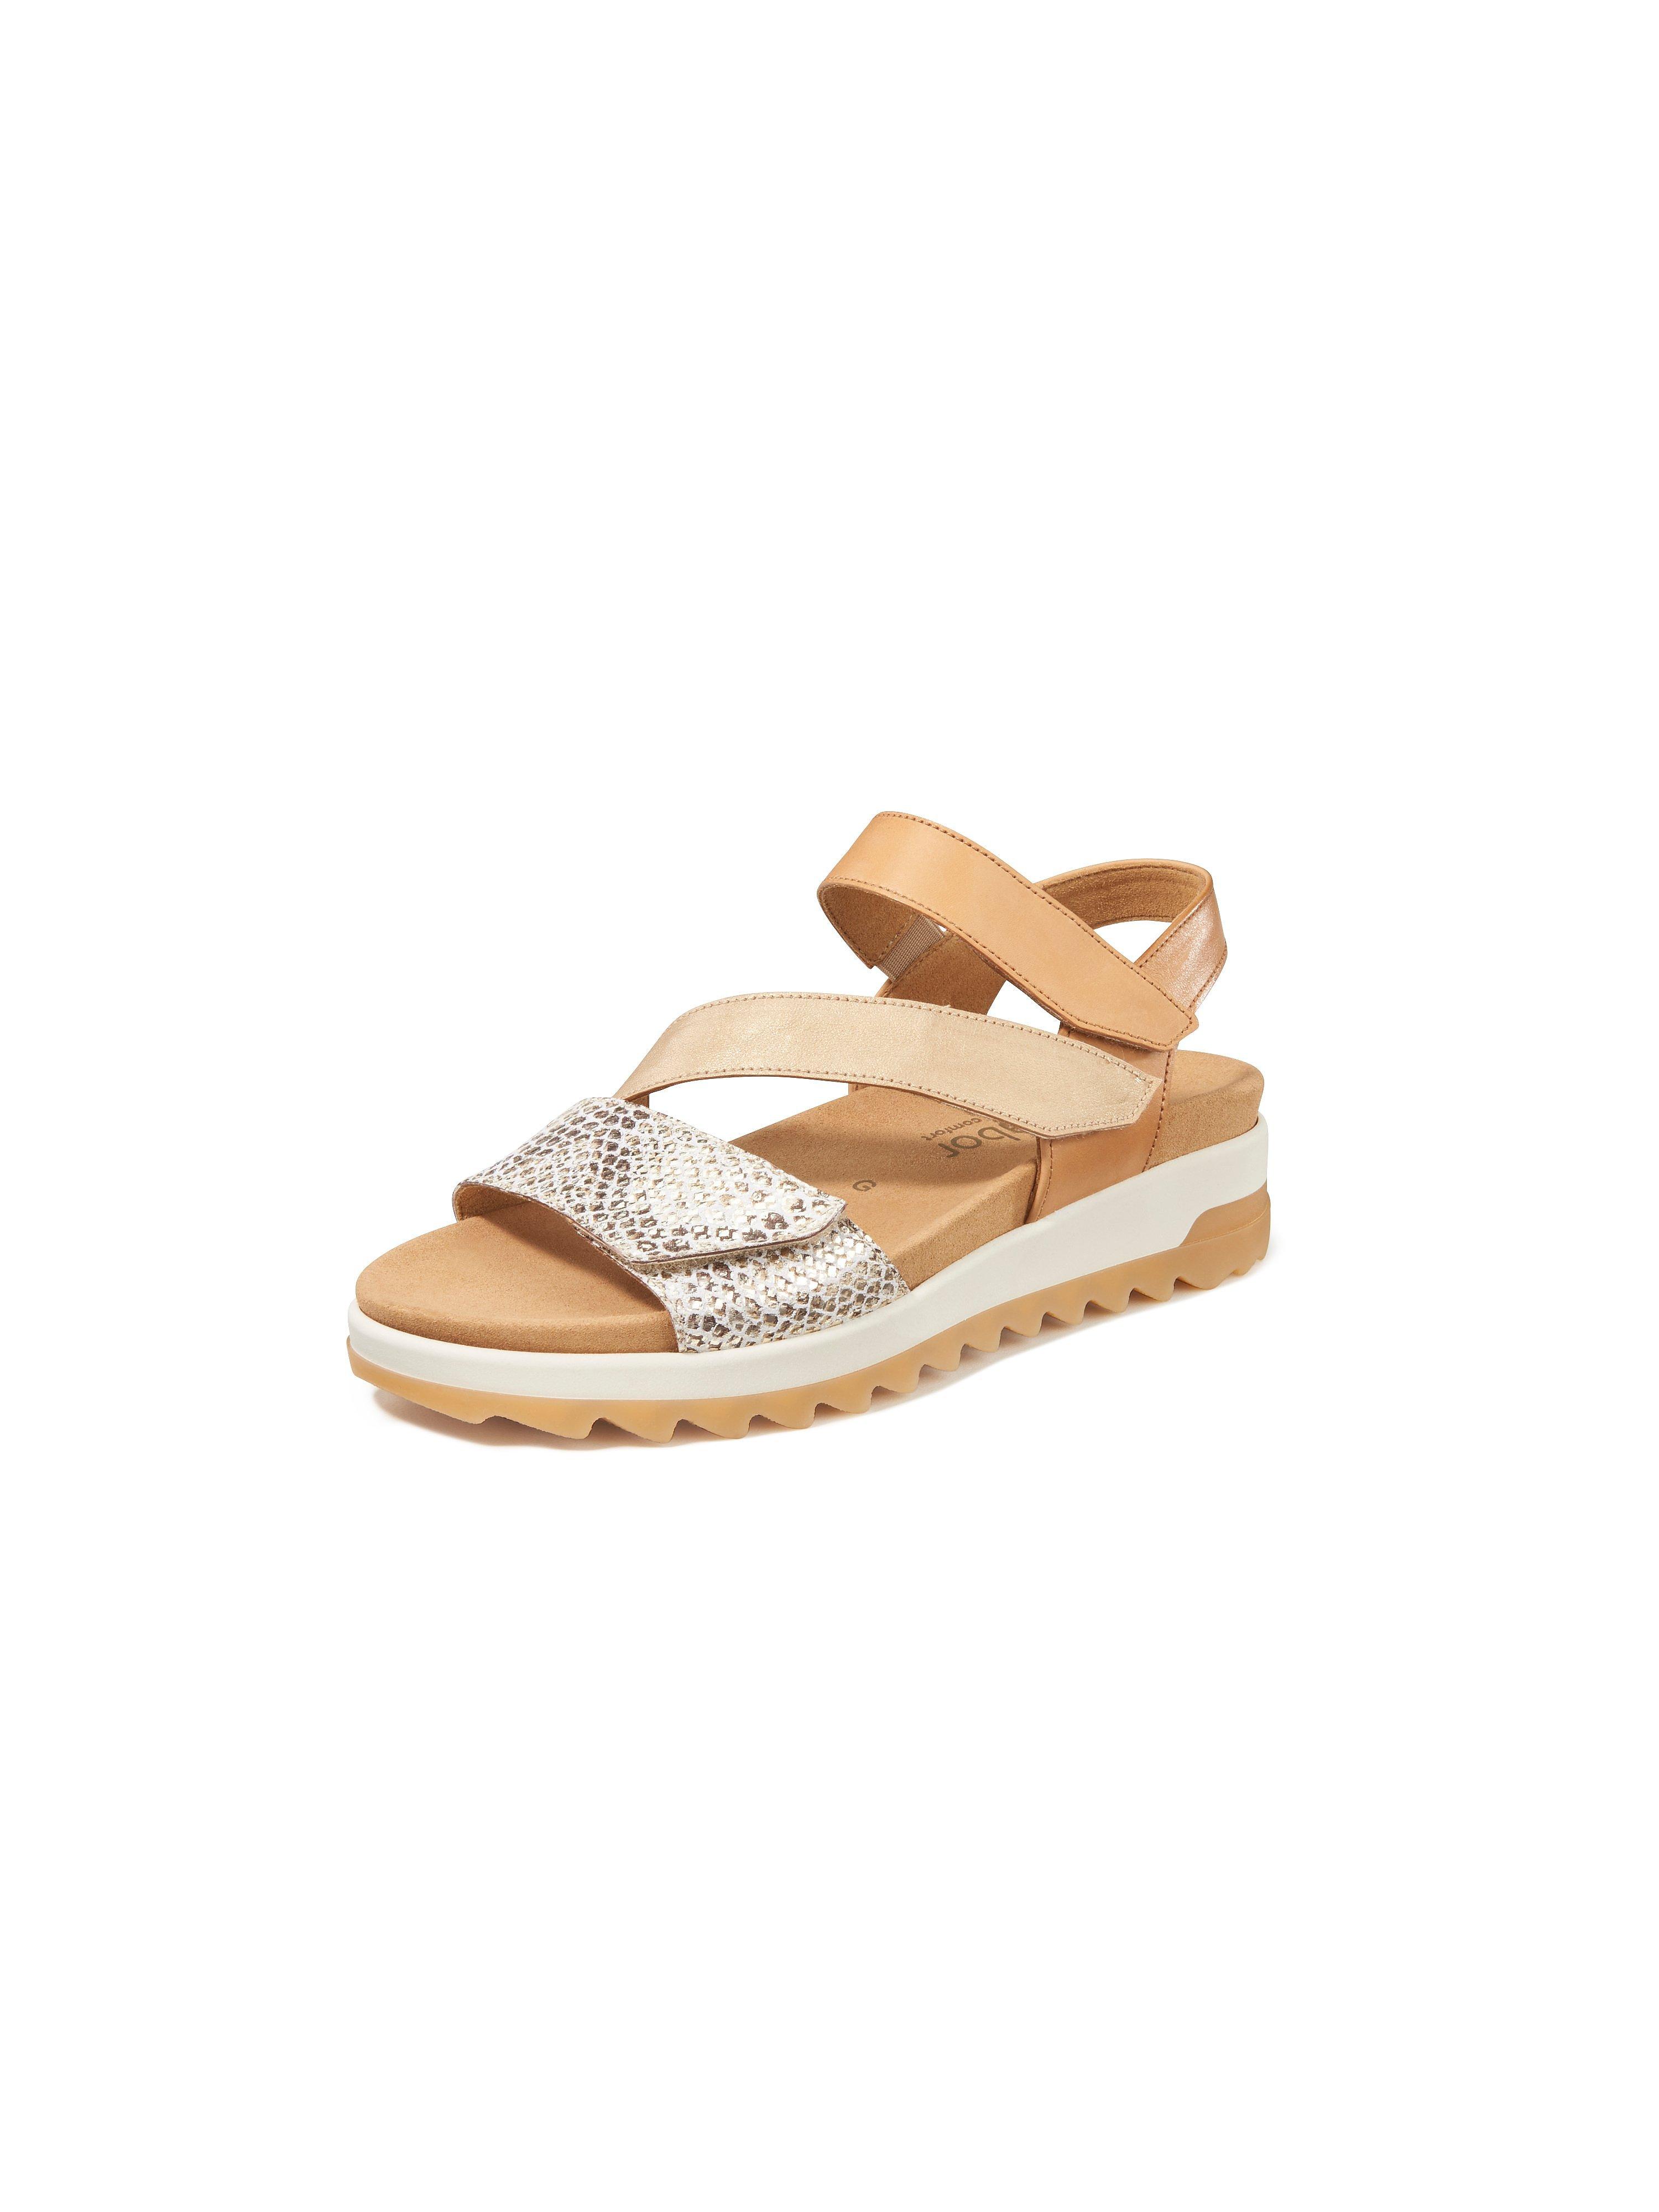 Sandals hook-and-loop straps Gabor Comfort brown